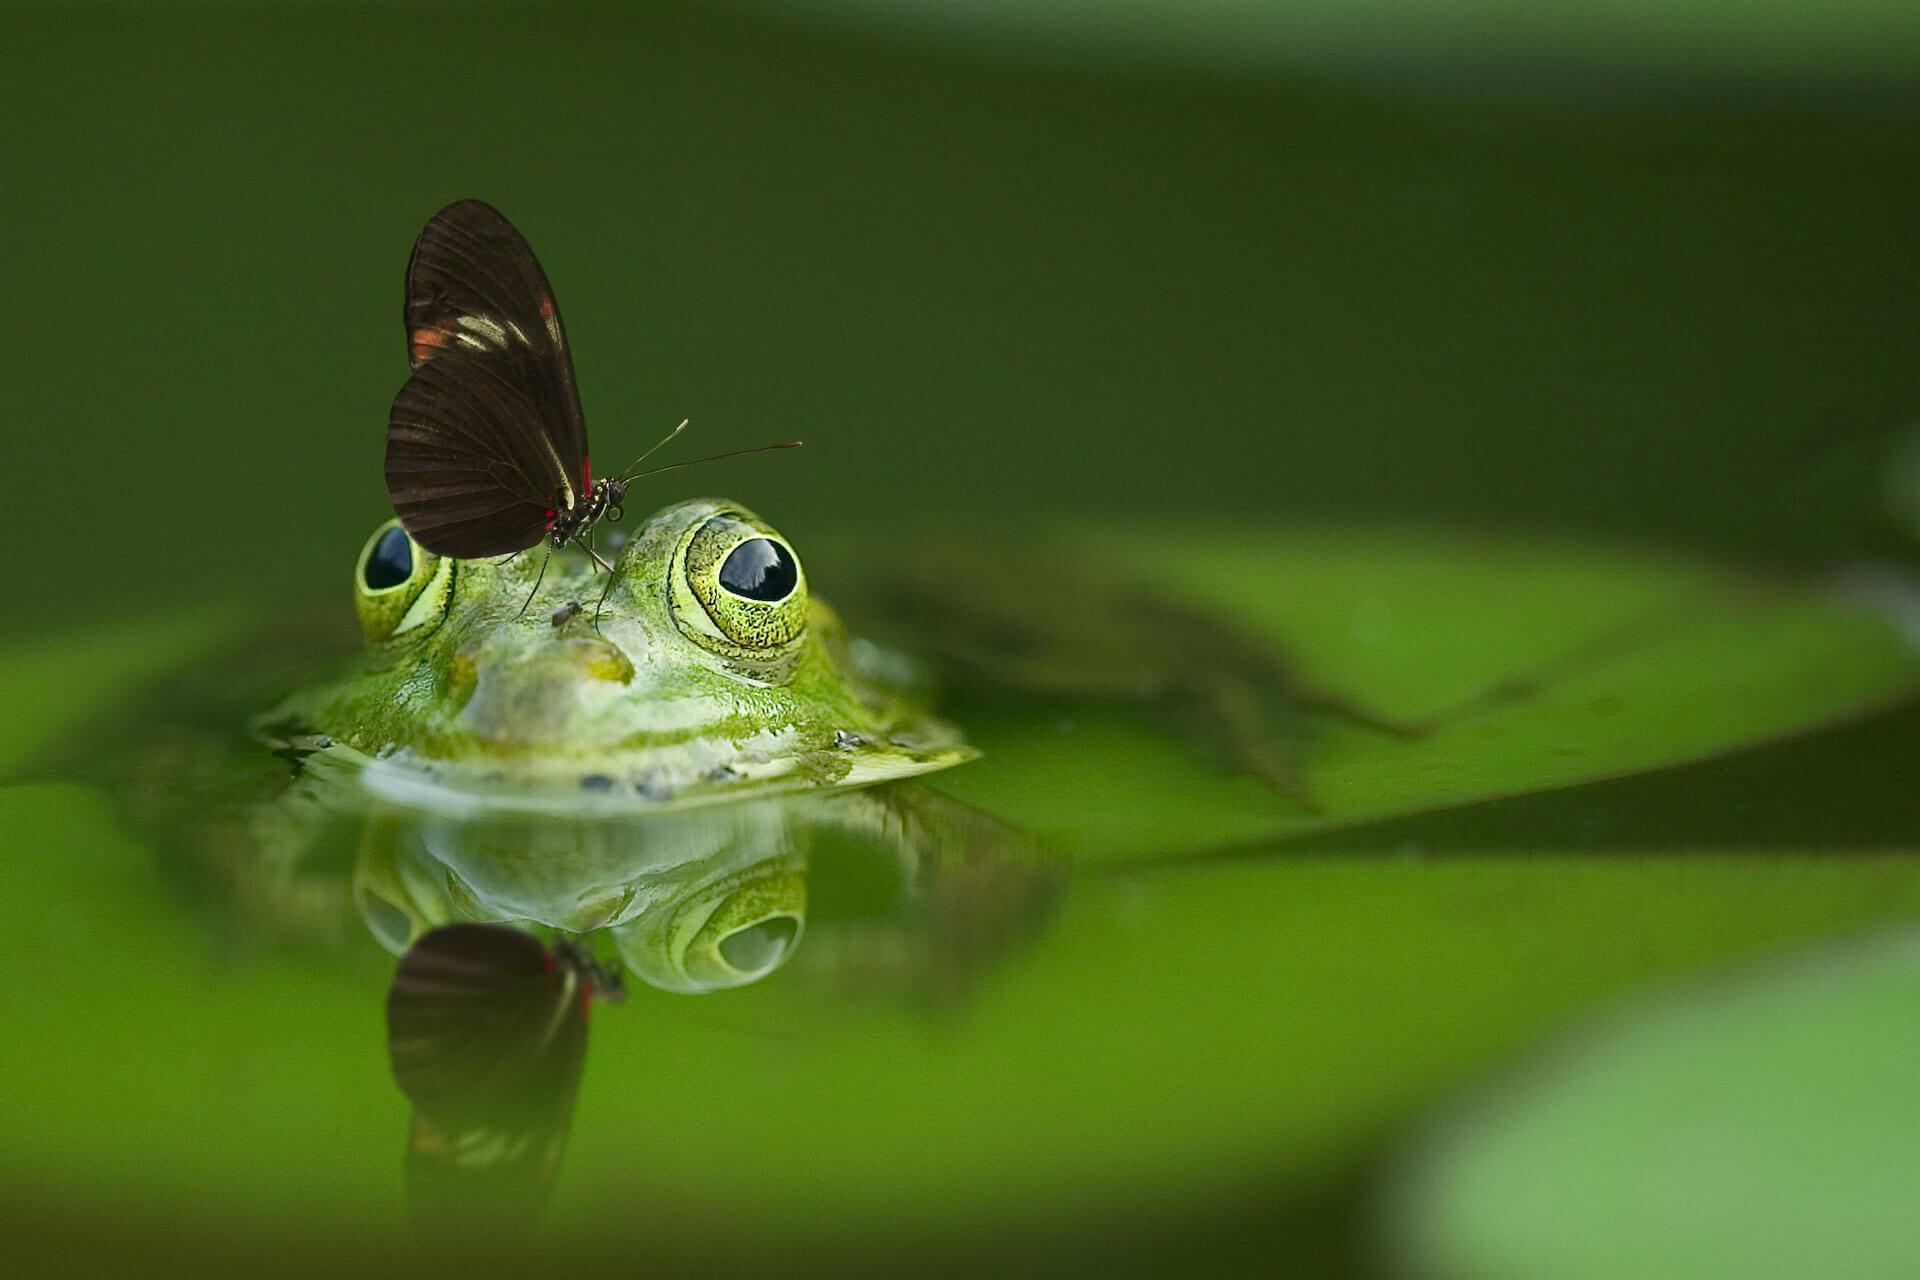 Ross-Pepper-Survival-Butterfly-Frog